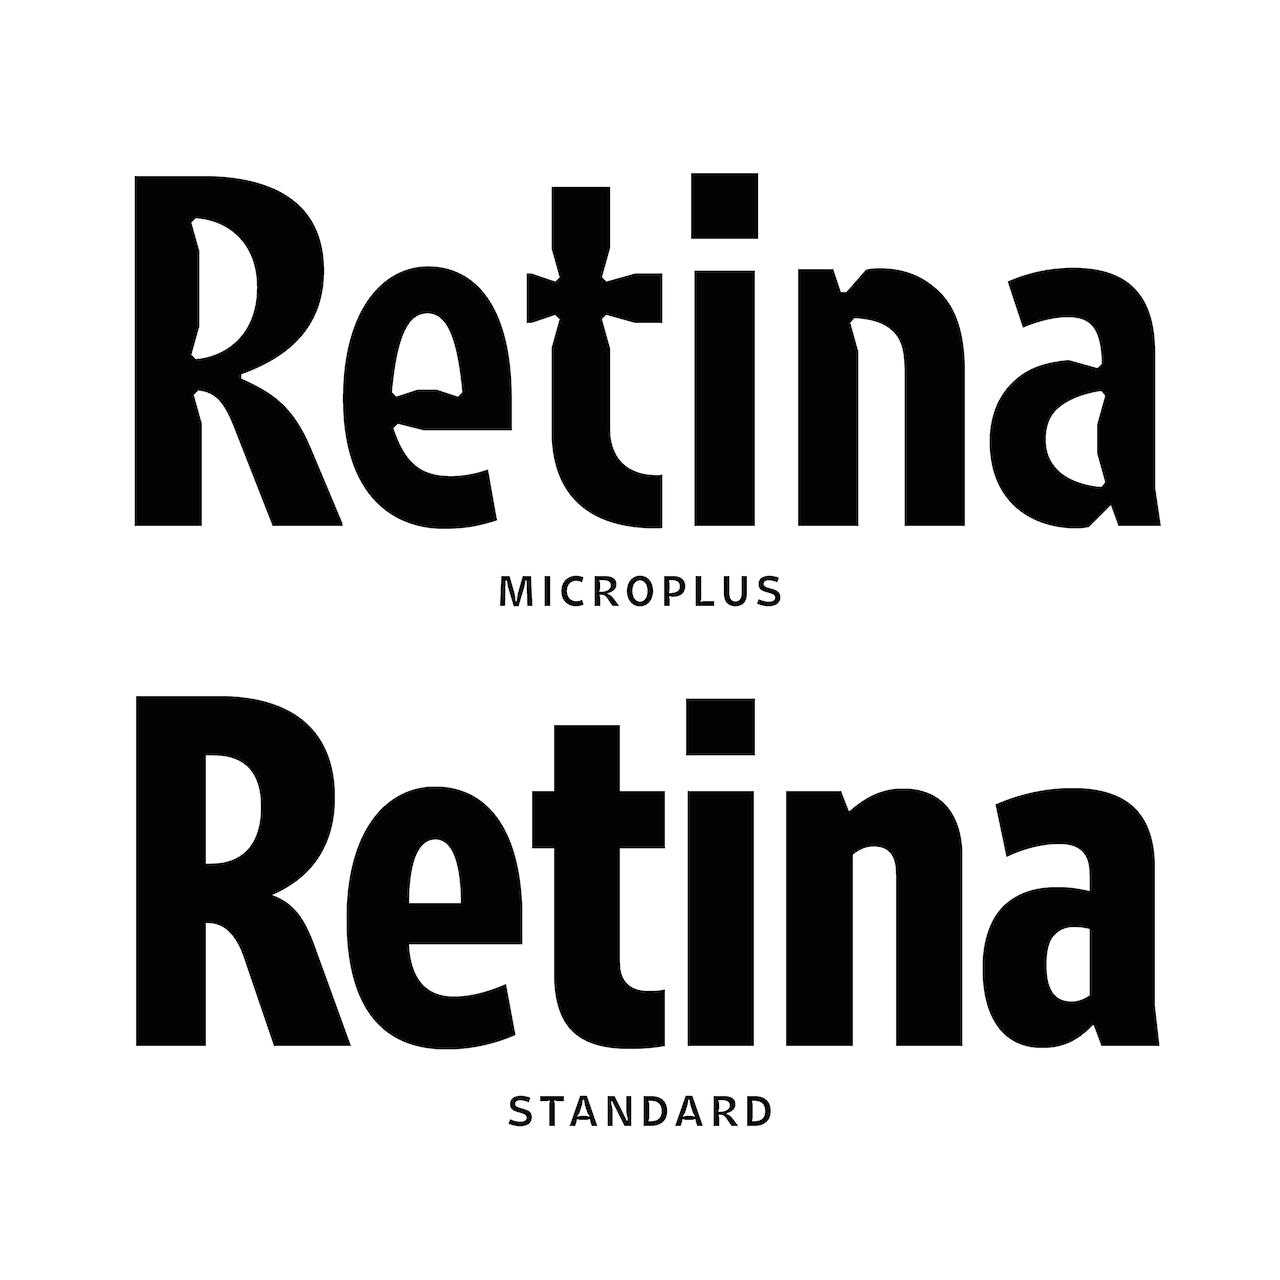 Retina MicroPlus and Retina